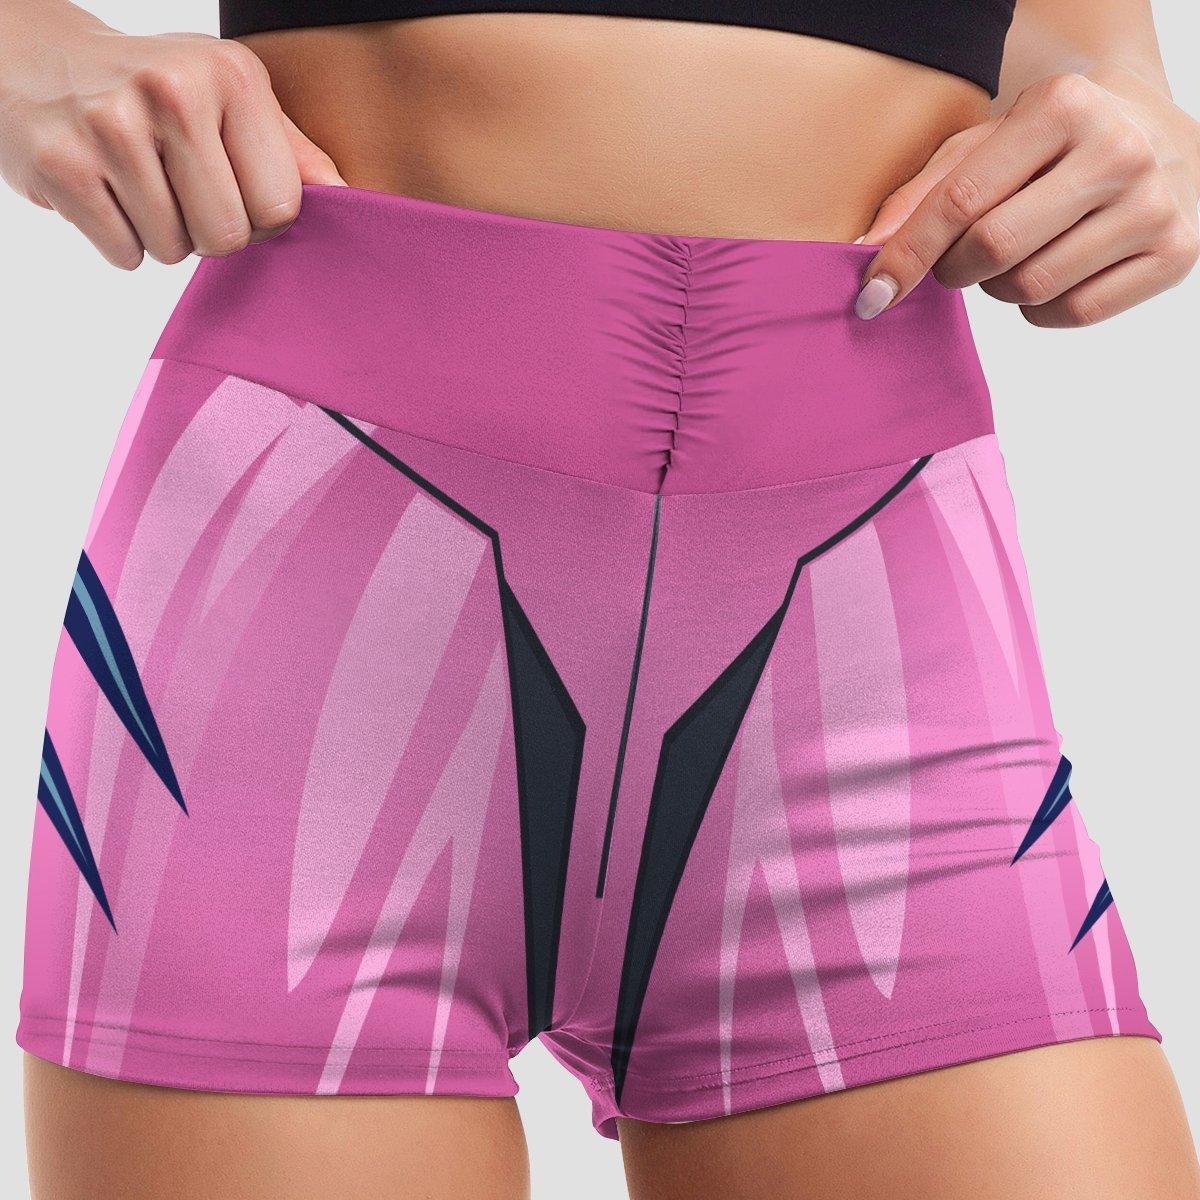 neon genesis mari active wear set 325074 - Anime Swimsuits